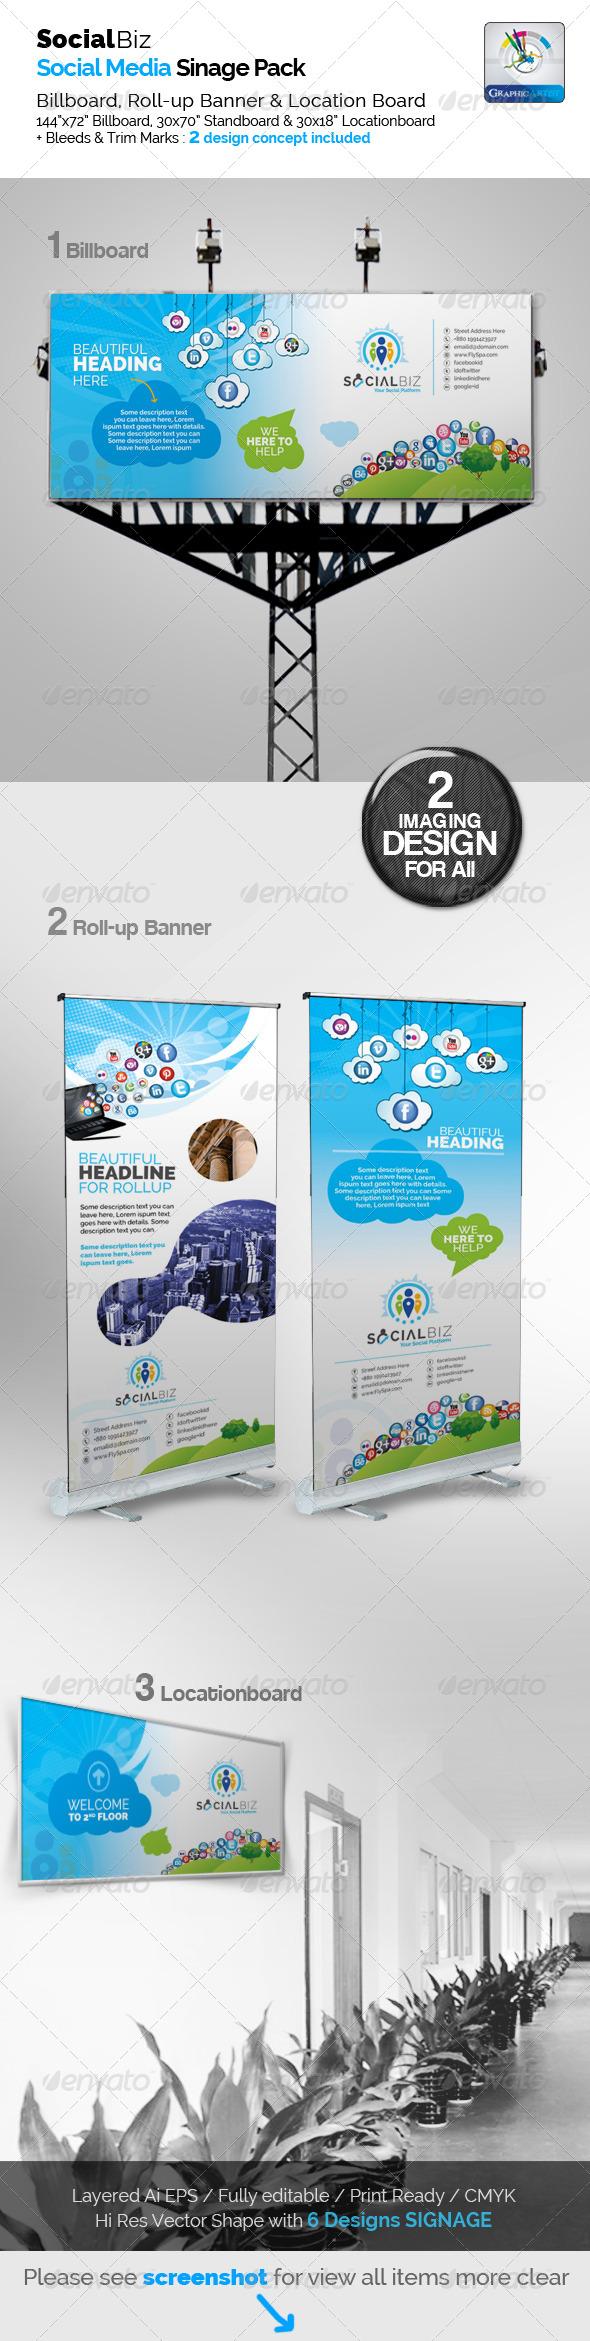 SocialBiz Clean Social Media Signage Pack